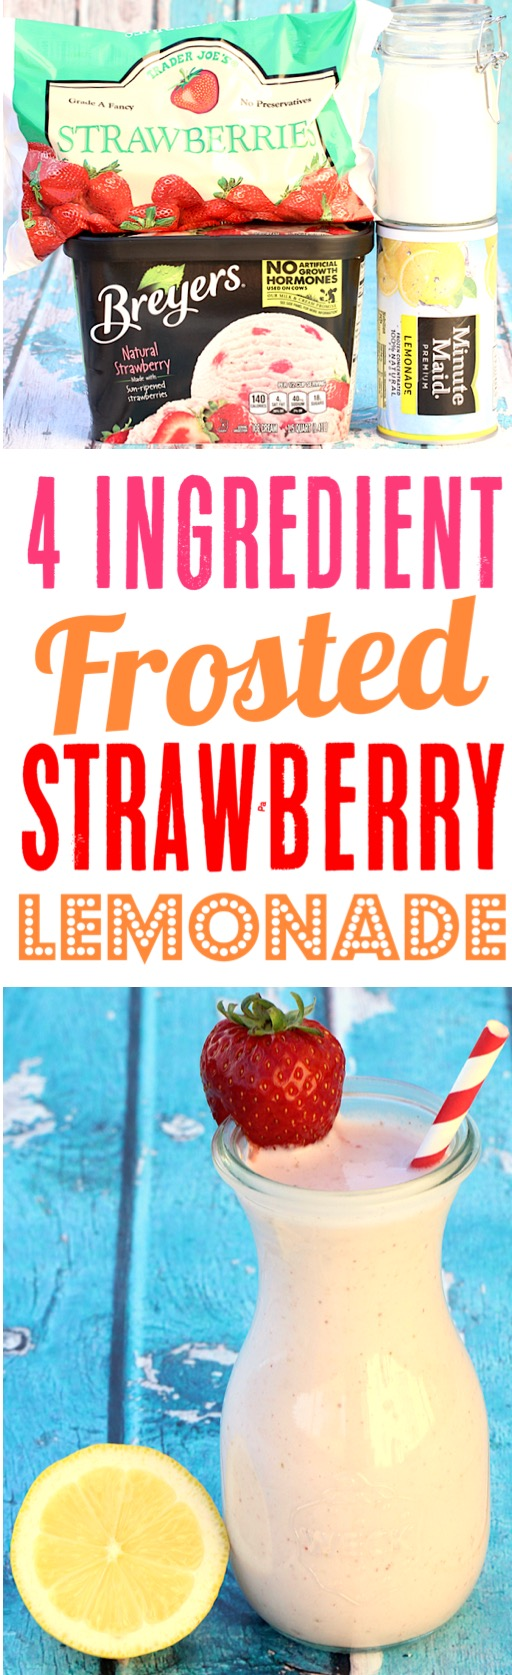 Frosted Lemonade Chick Fil A Copycat Recipe - Strawberry Lemonade Milkshake